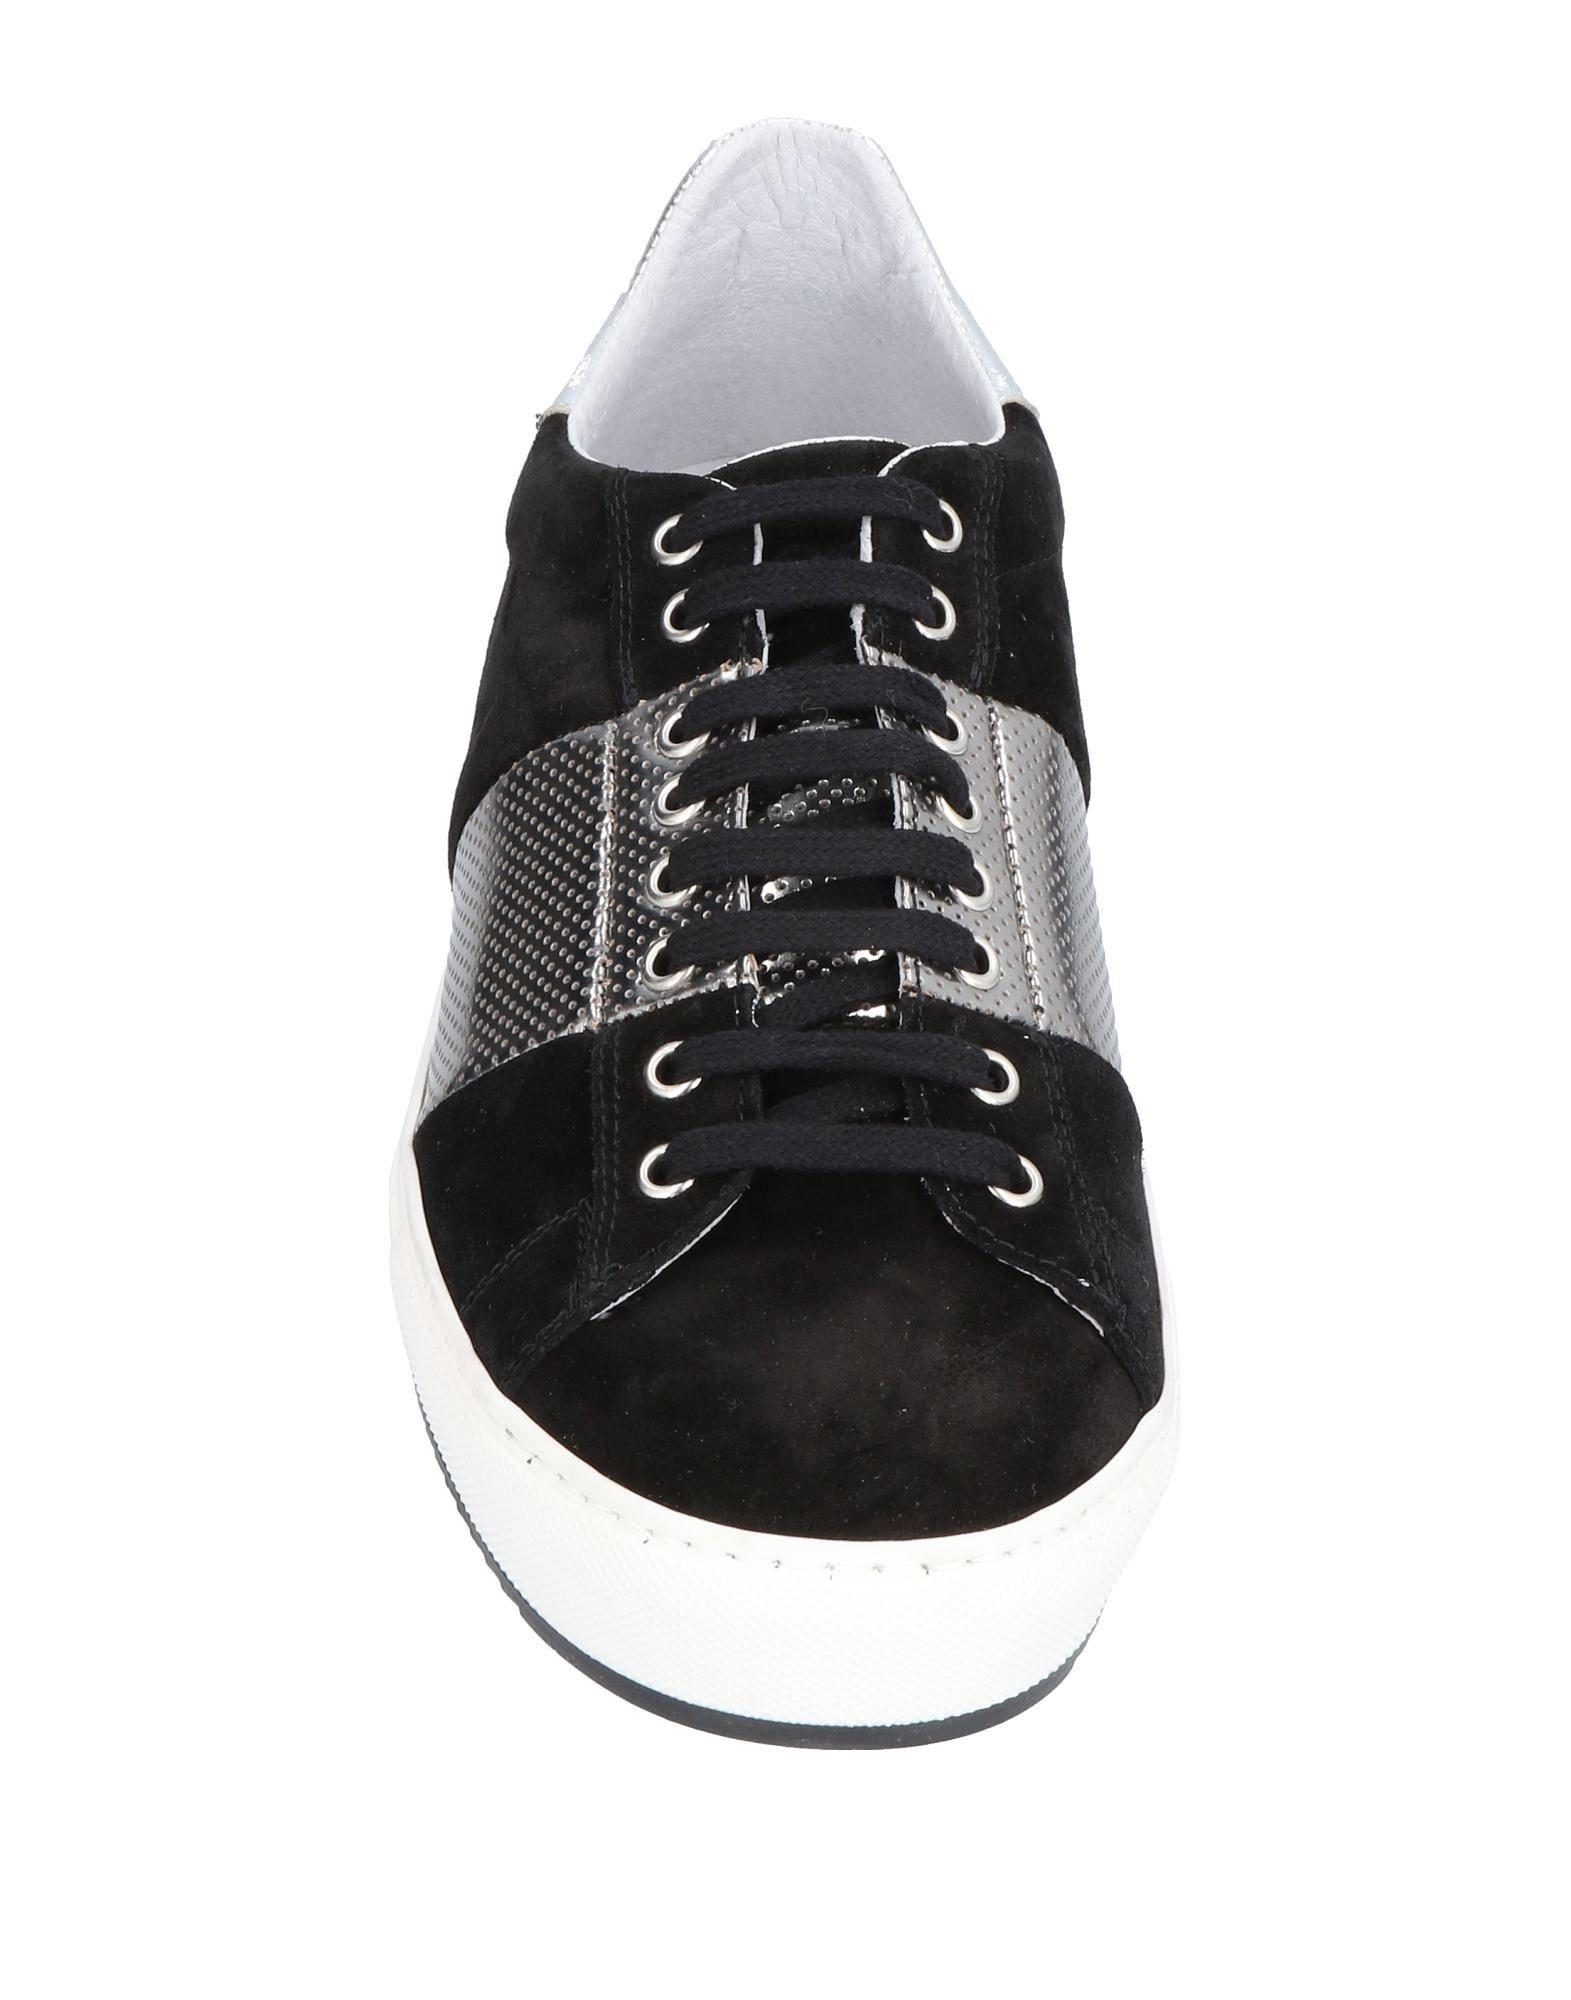 Rabatt echte Schuhe Daniele Alessandrini Homme Sneakers Herren  11499122DV